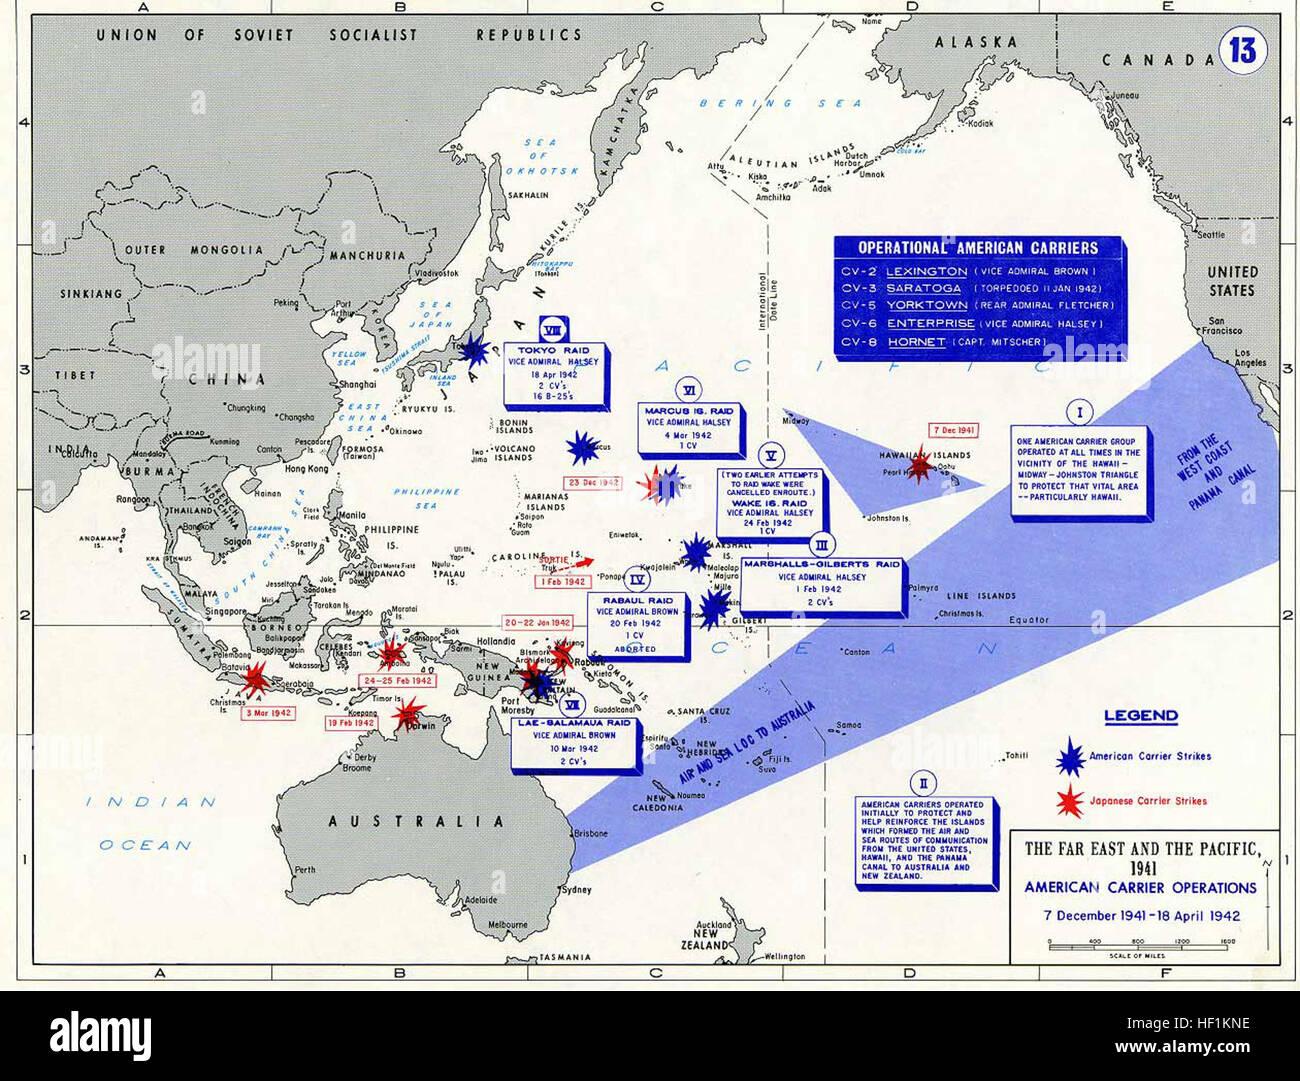 Pacific War - American Carrier OP 1941-42 - Map Stock Photo ...